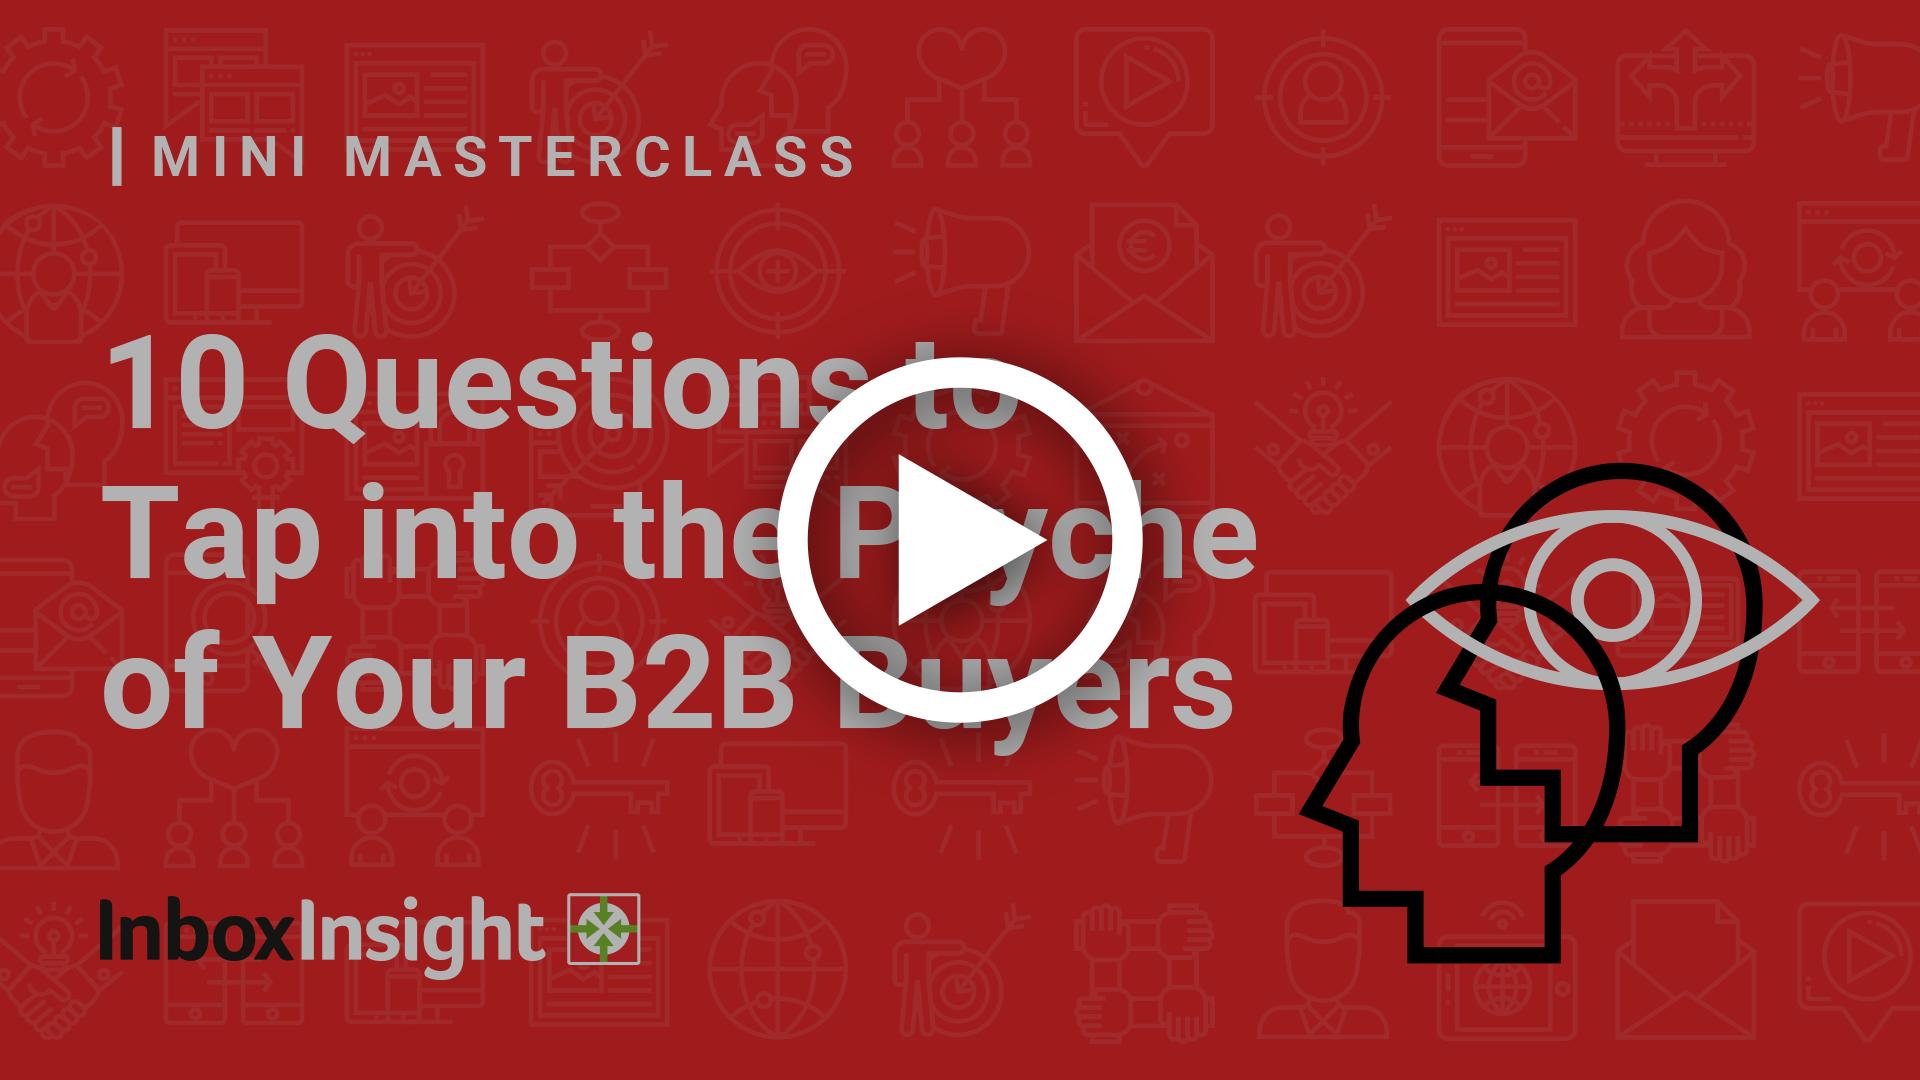 Mini Masterclass 10 questions video